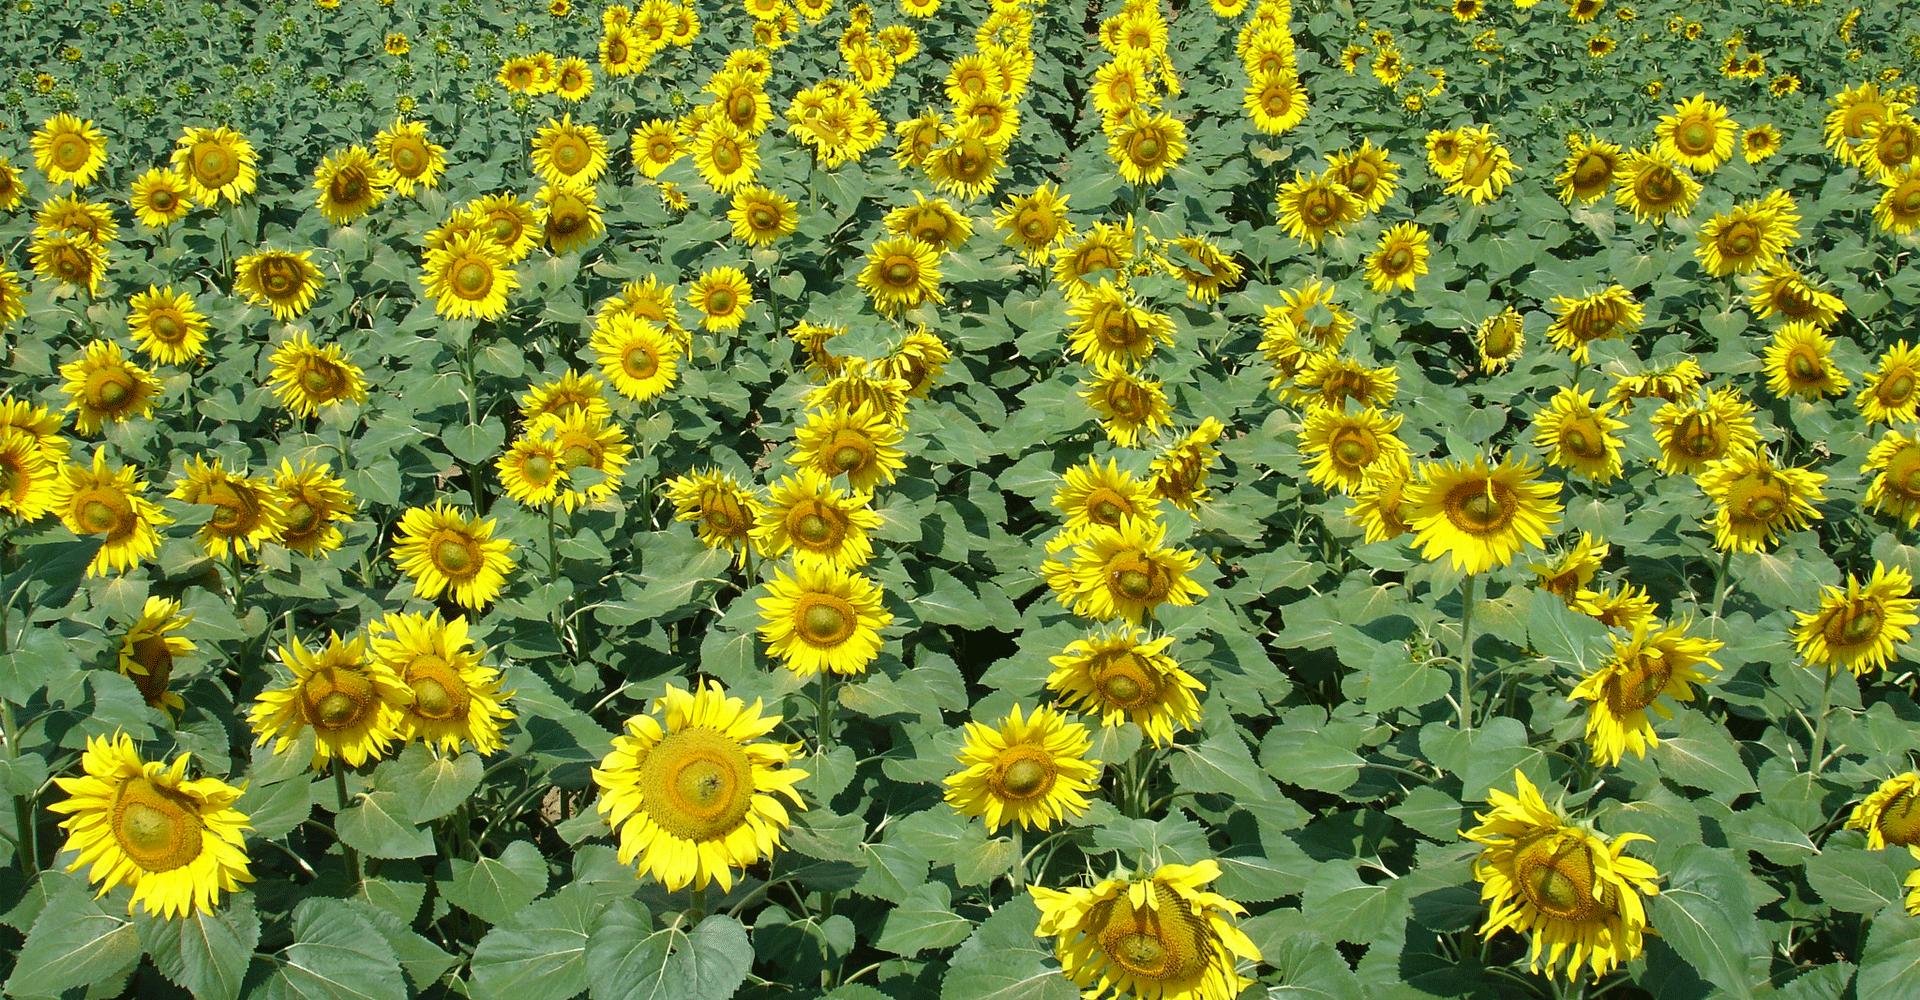 KWS SAAT SE page image of sunflower field